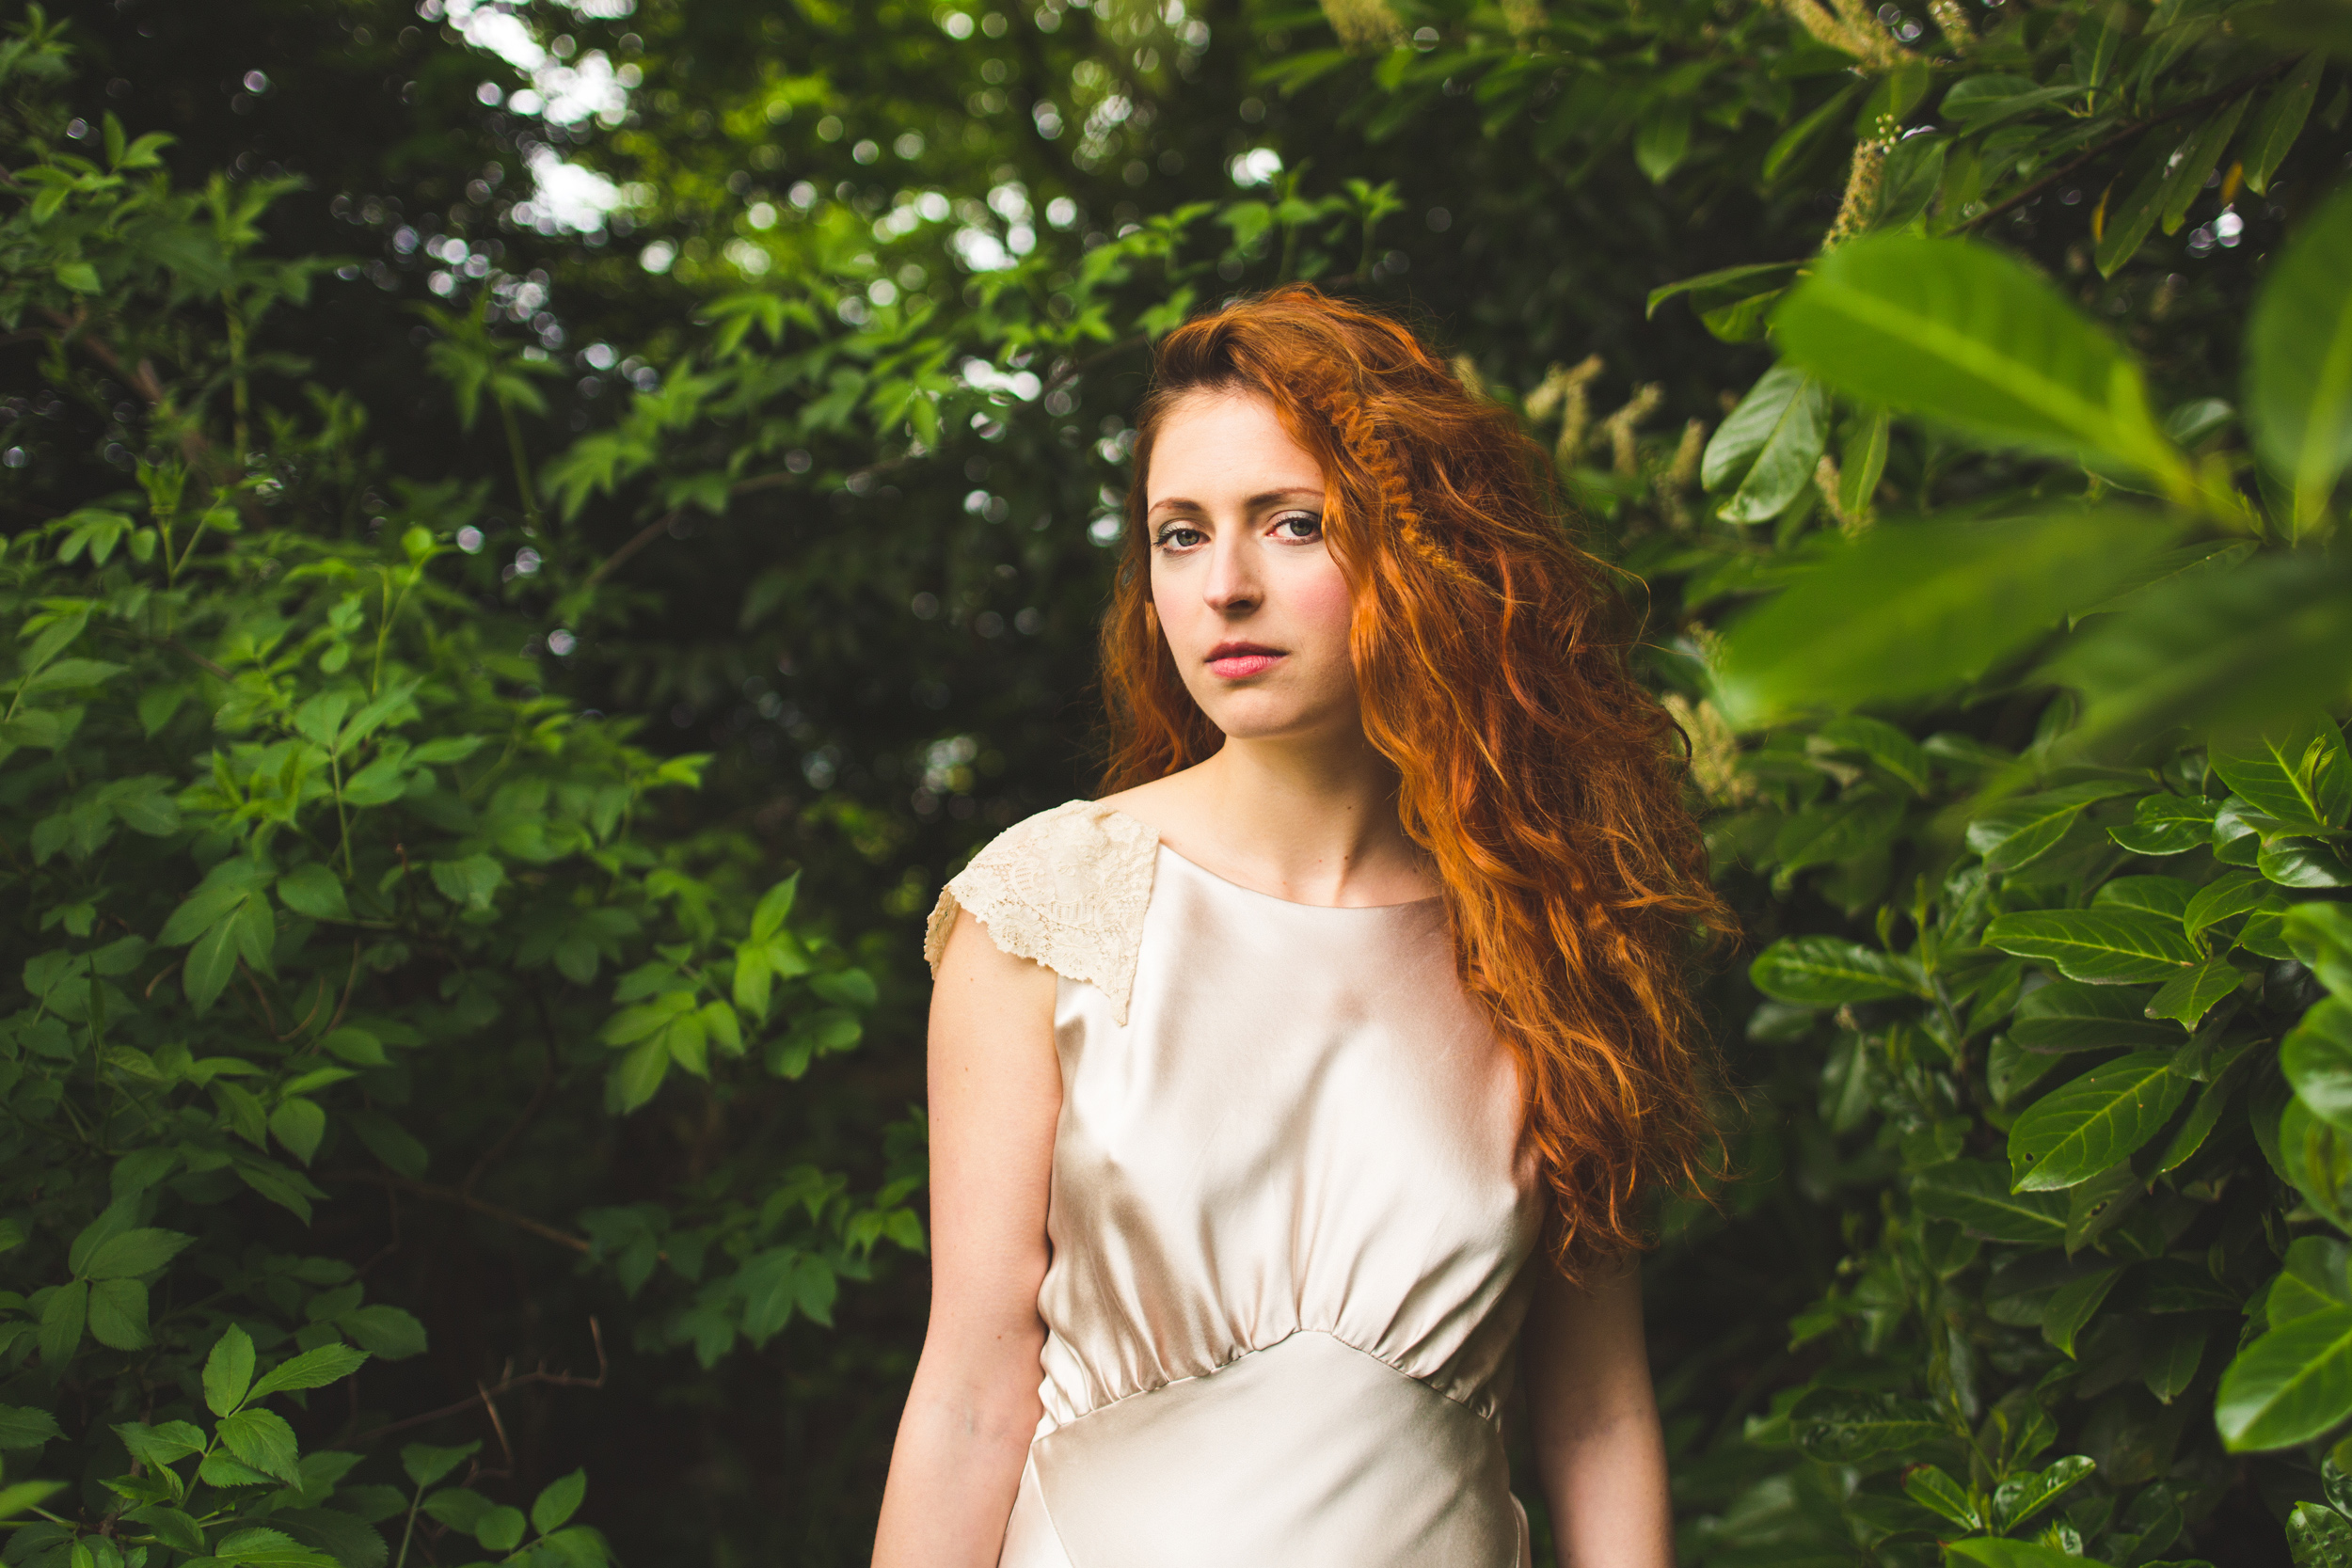 kate-beaumont-vintage-inspired-bridal-wedding-dresses-Sheffield-S6-30.jpg